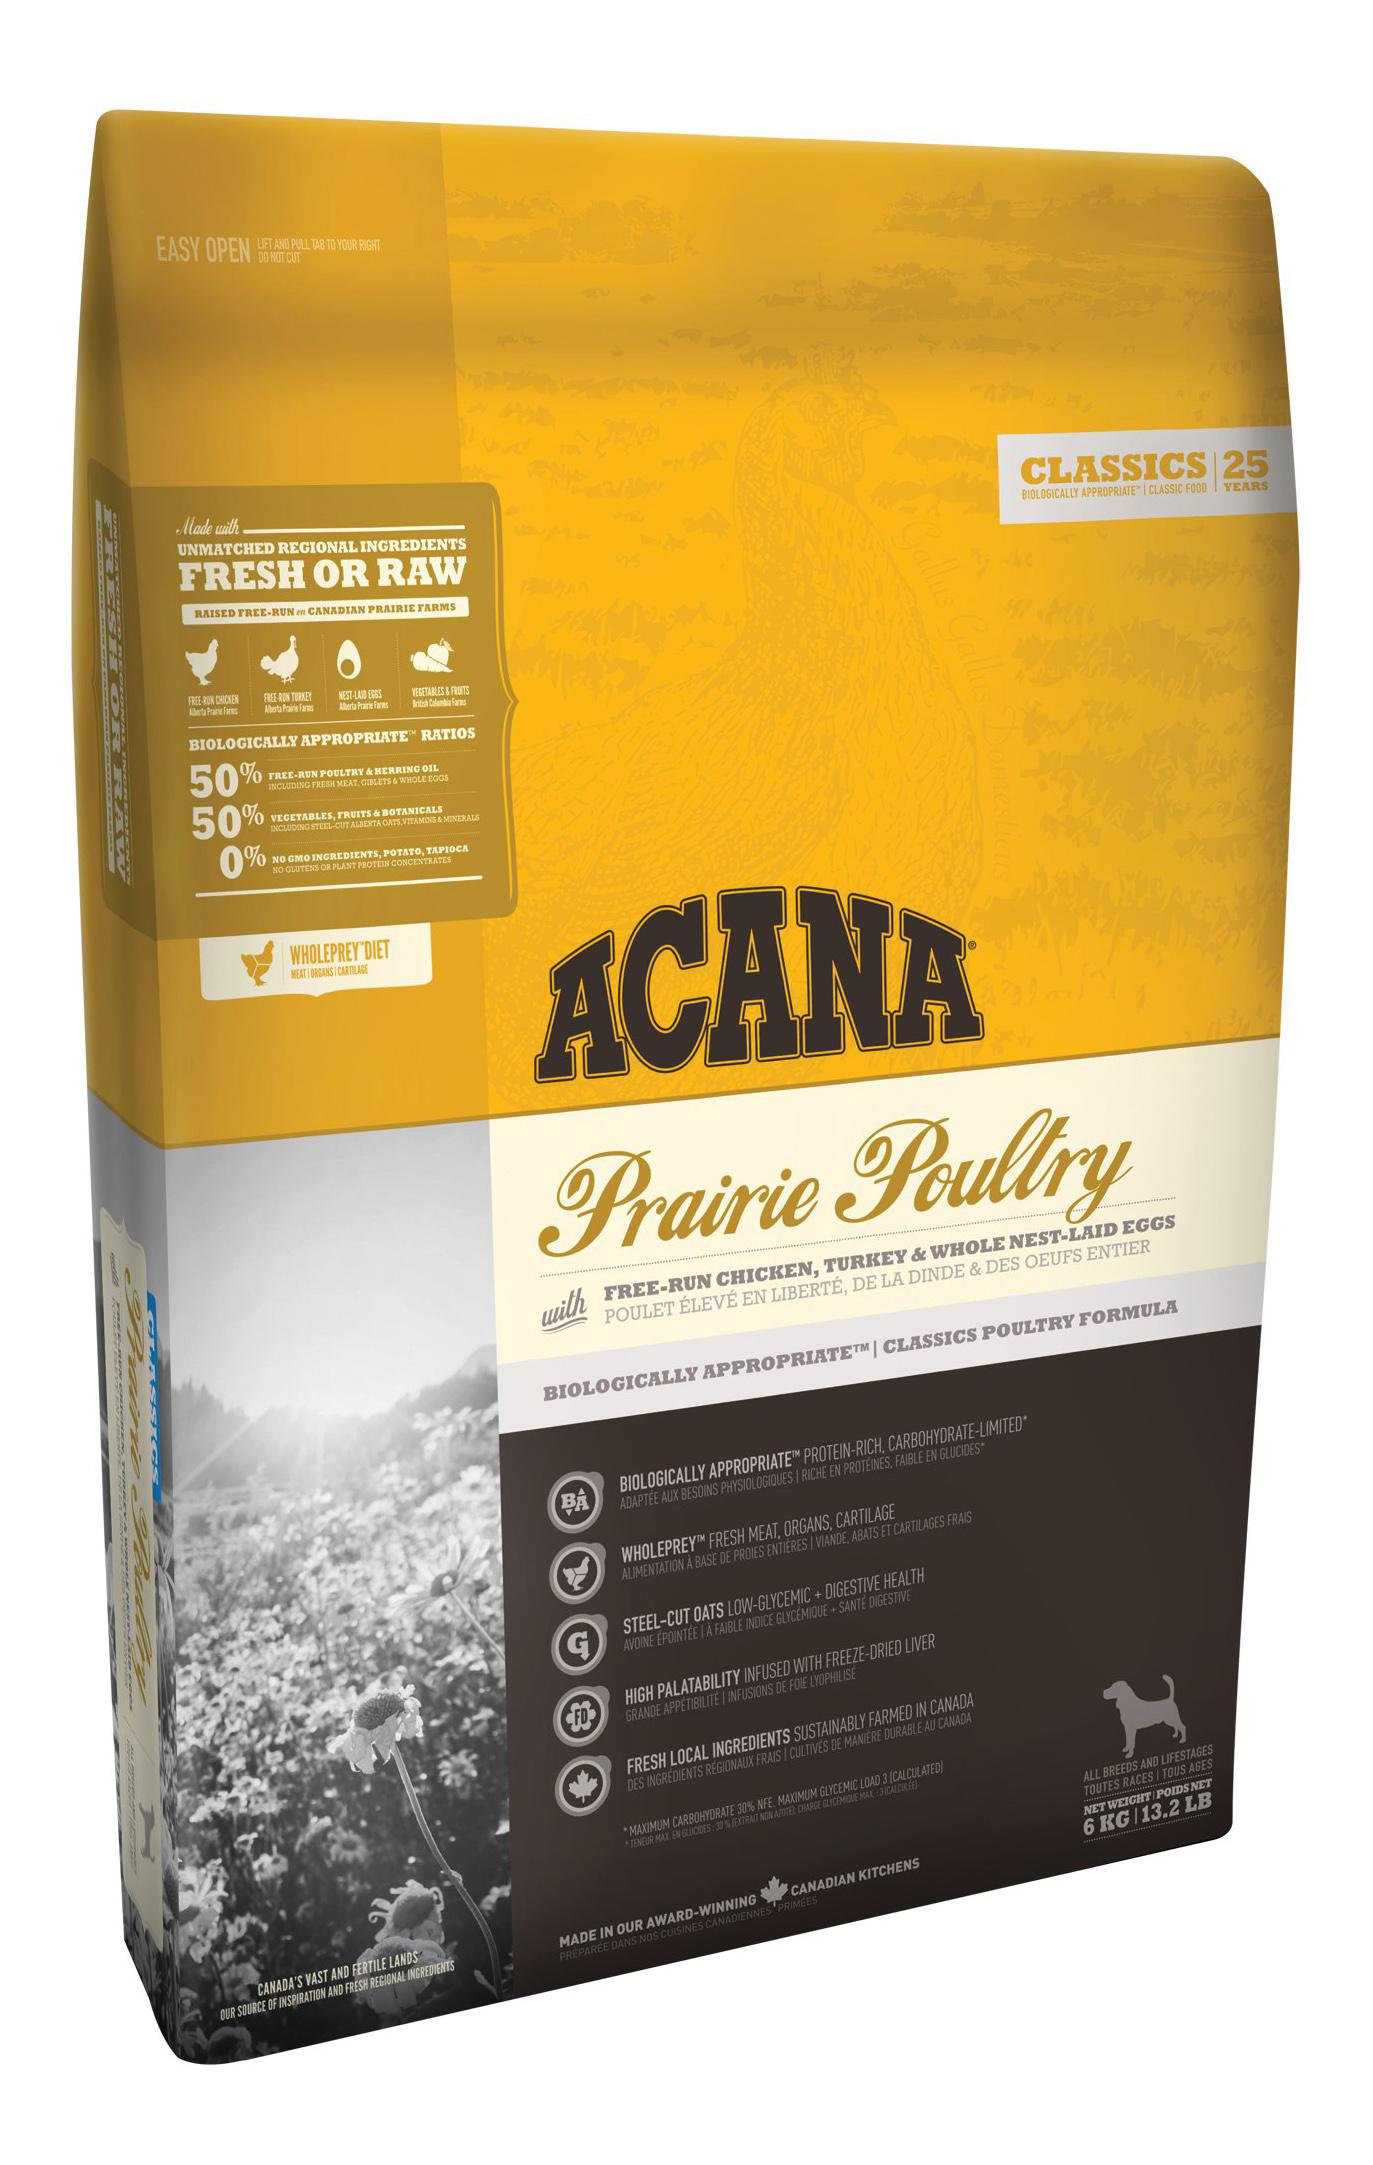 Сухой корм для собак ACANA Classics Prairie Poultry, индейка, курица, овес, 2кг фото